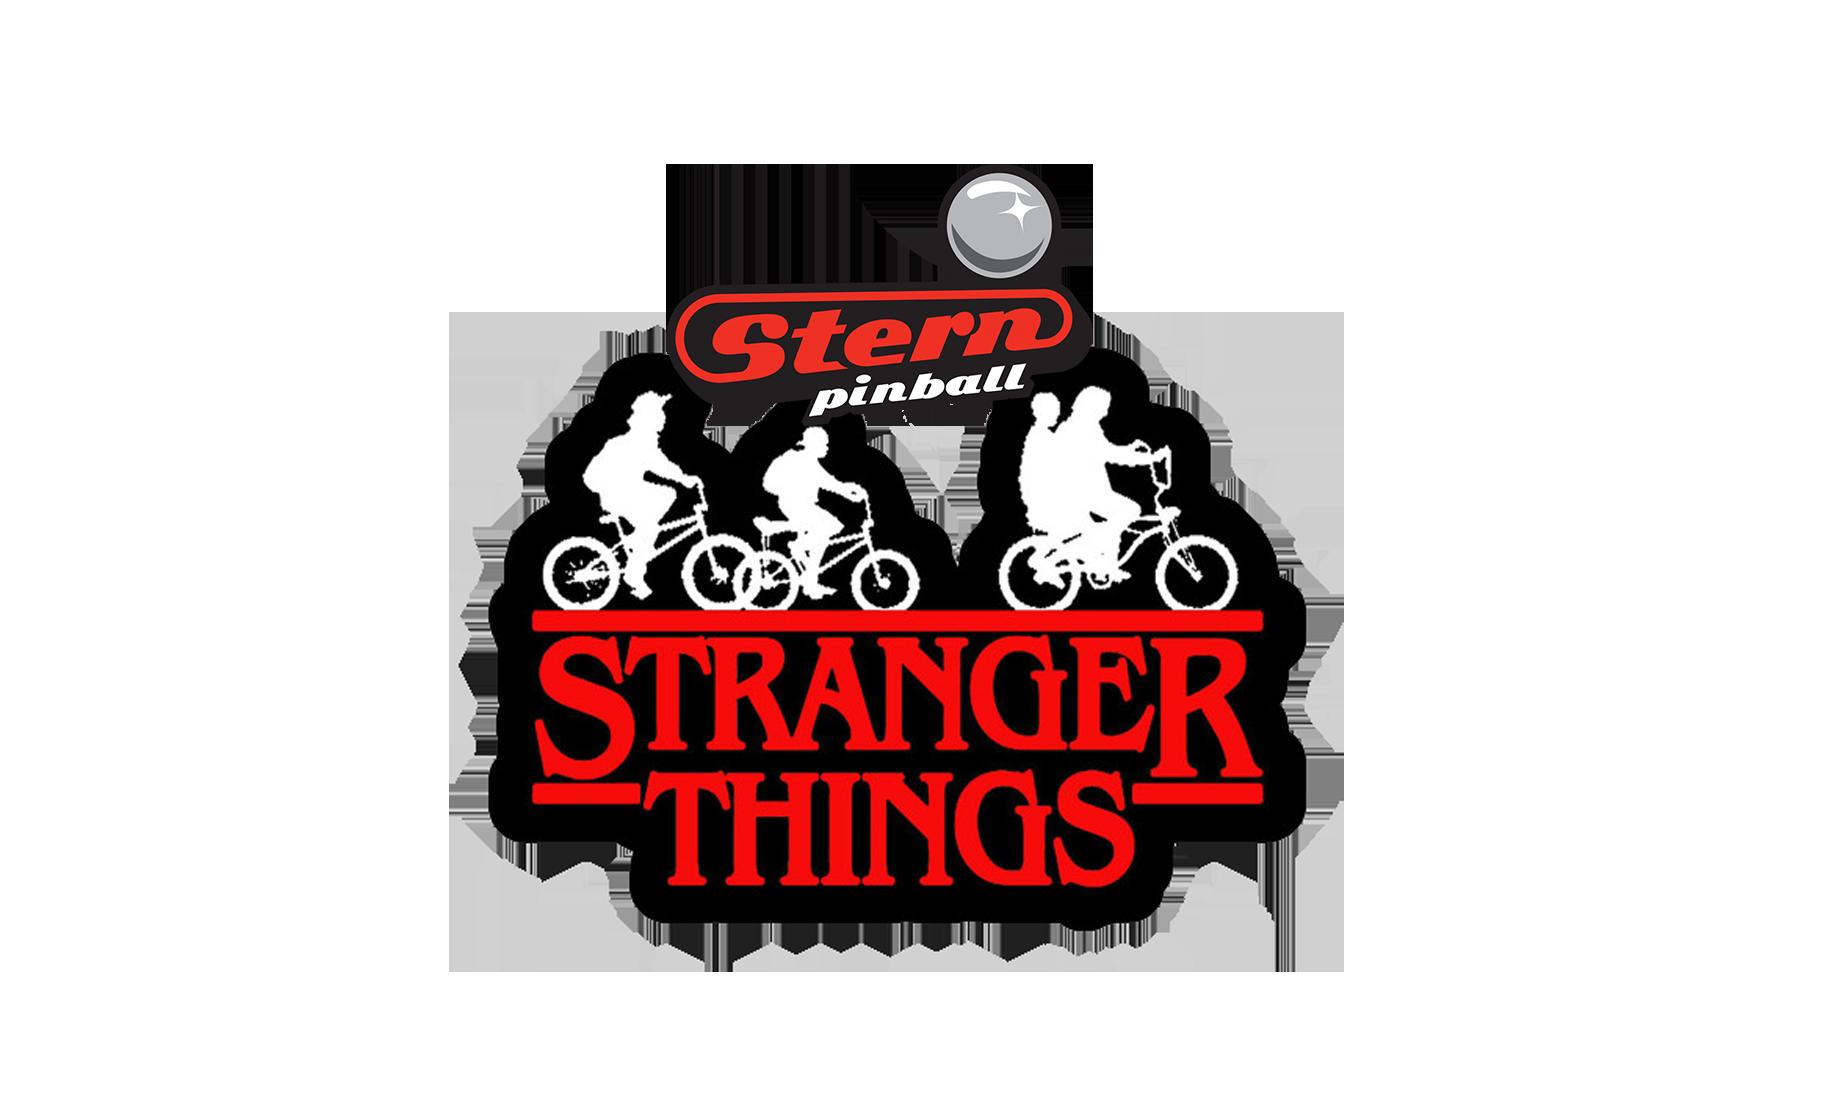 Stranger Things| Seeben